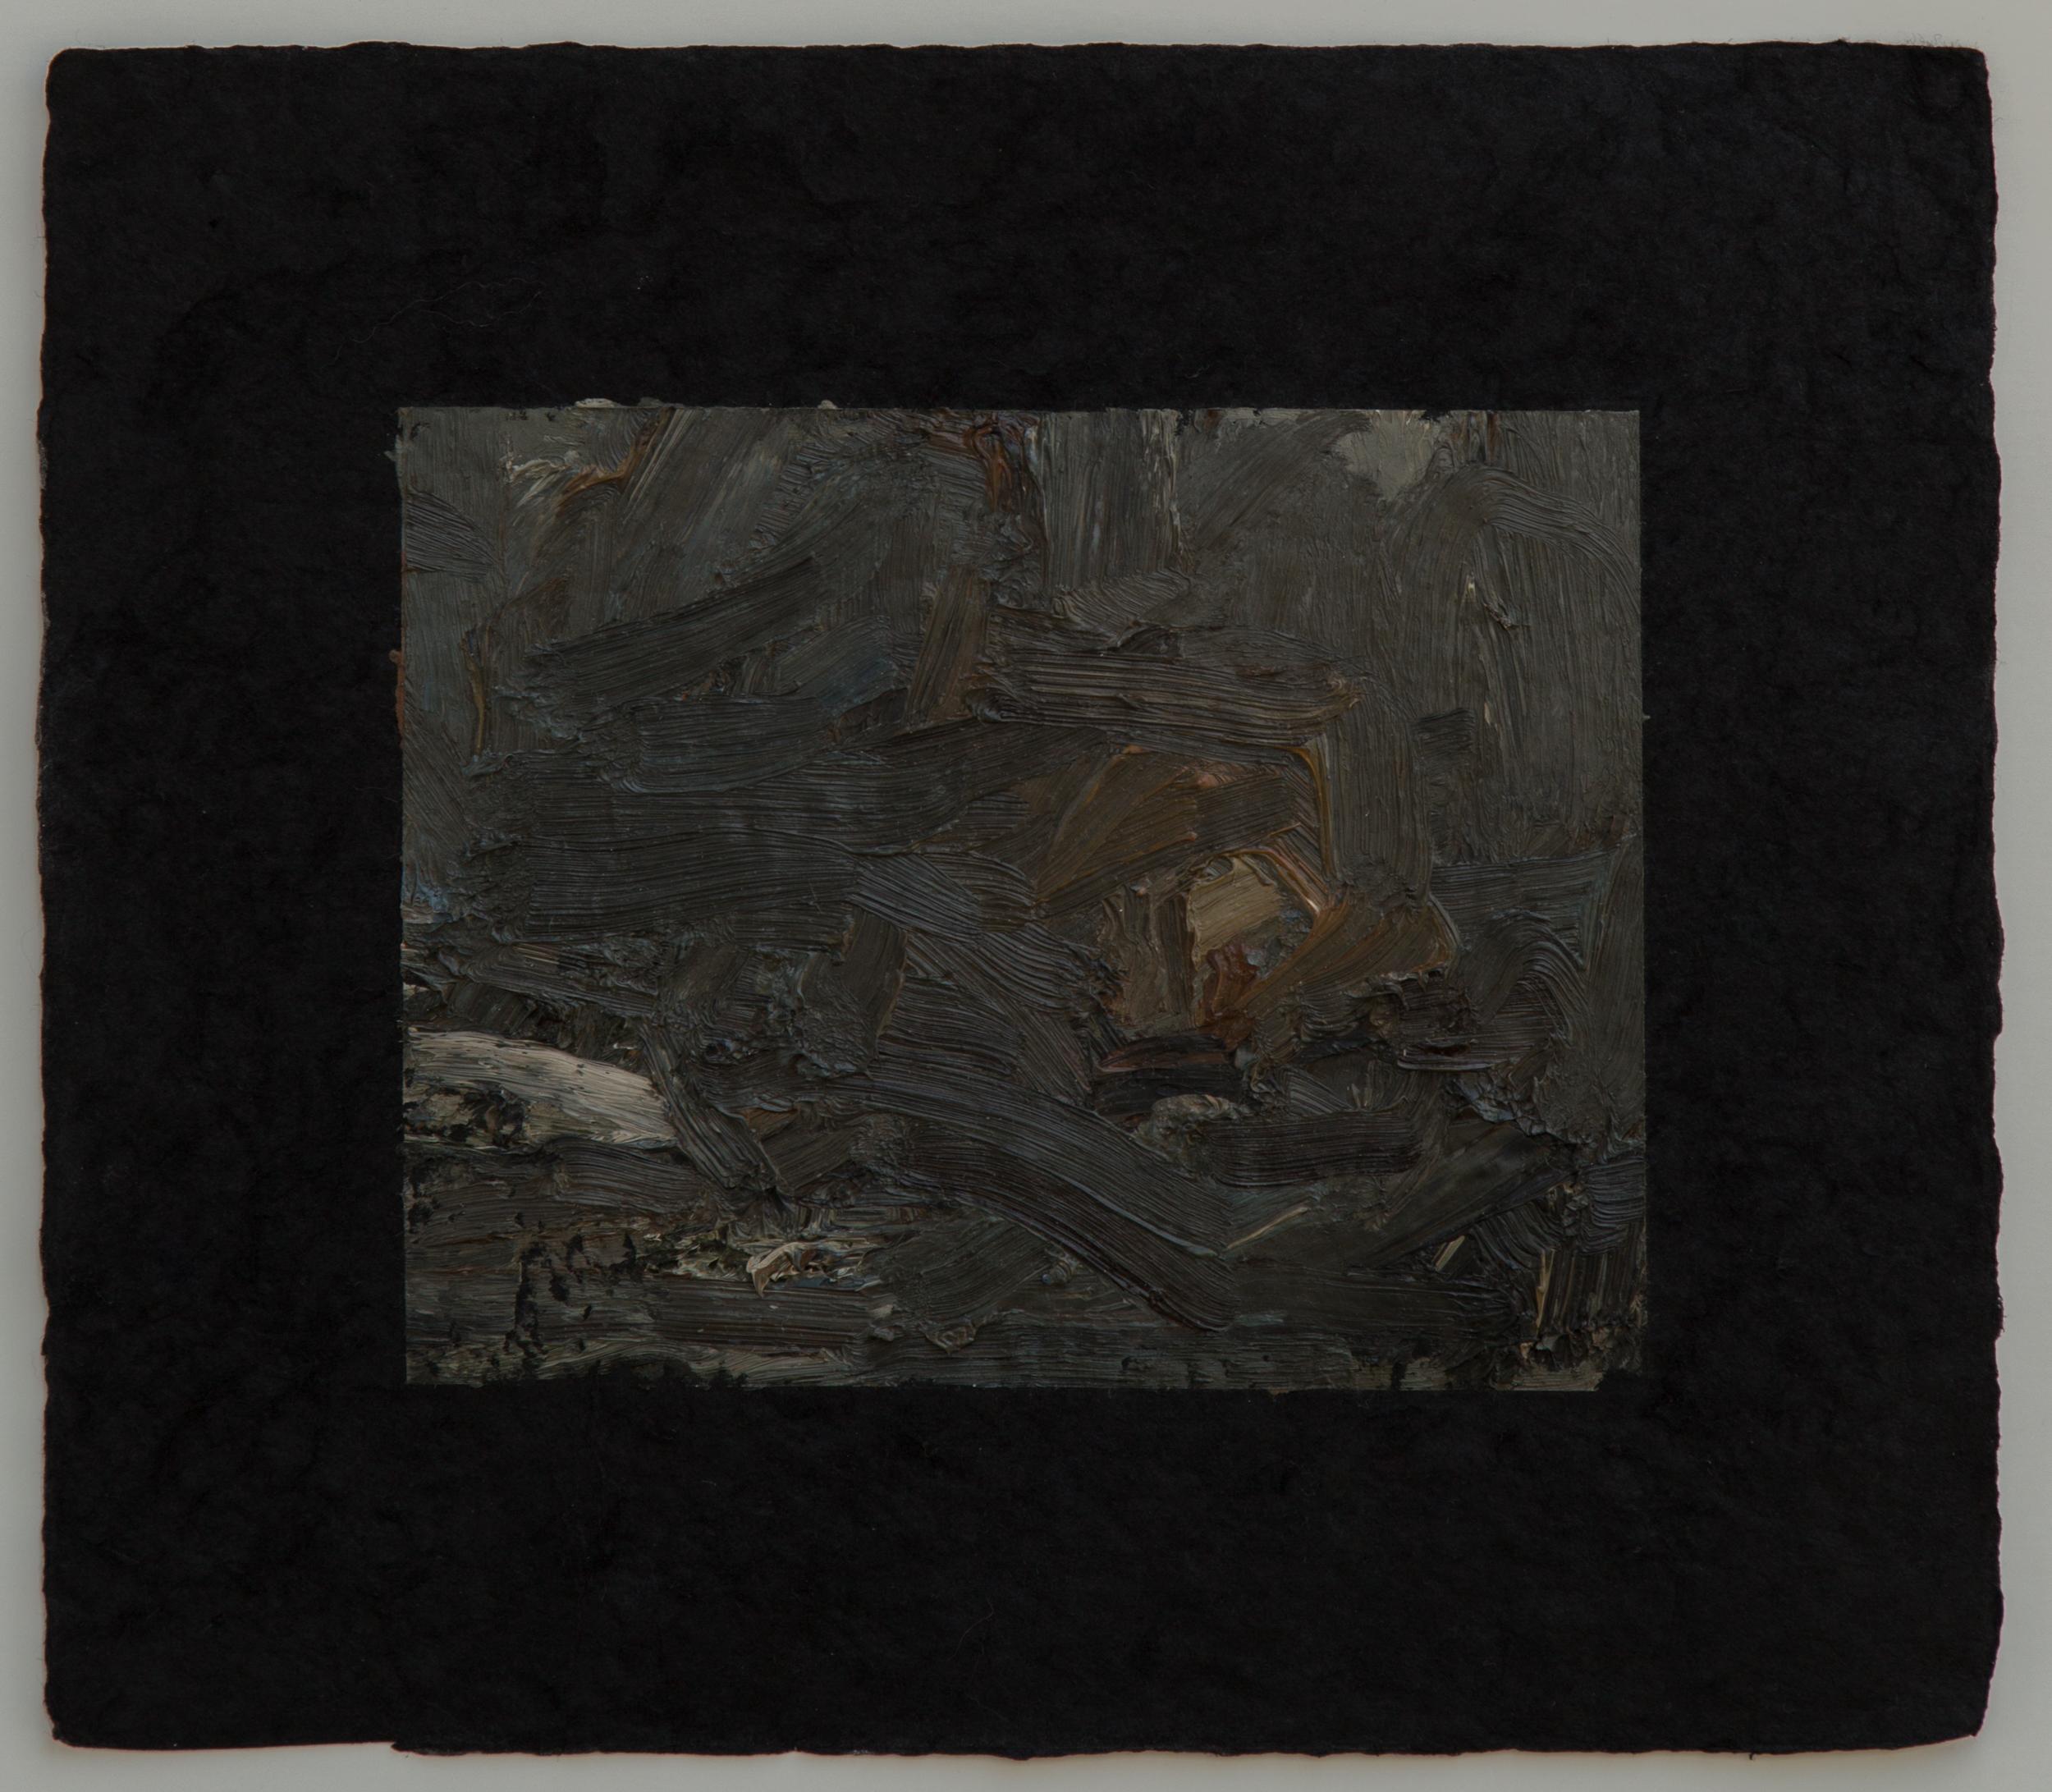 "Campfire study VIII, 9 x 10"", 2016"